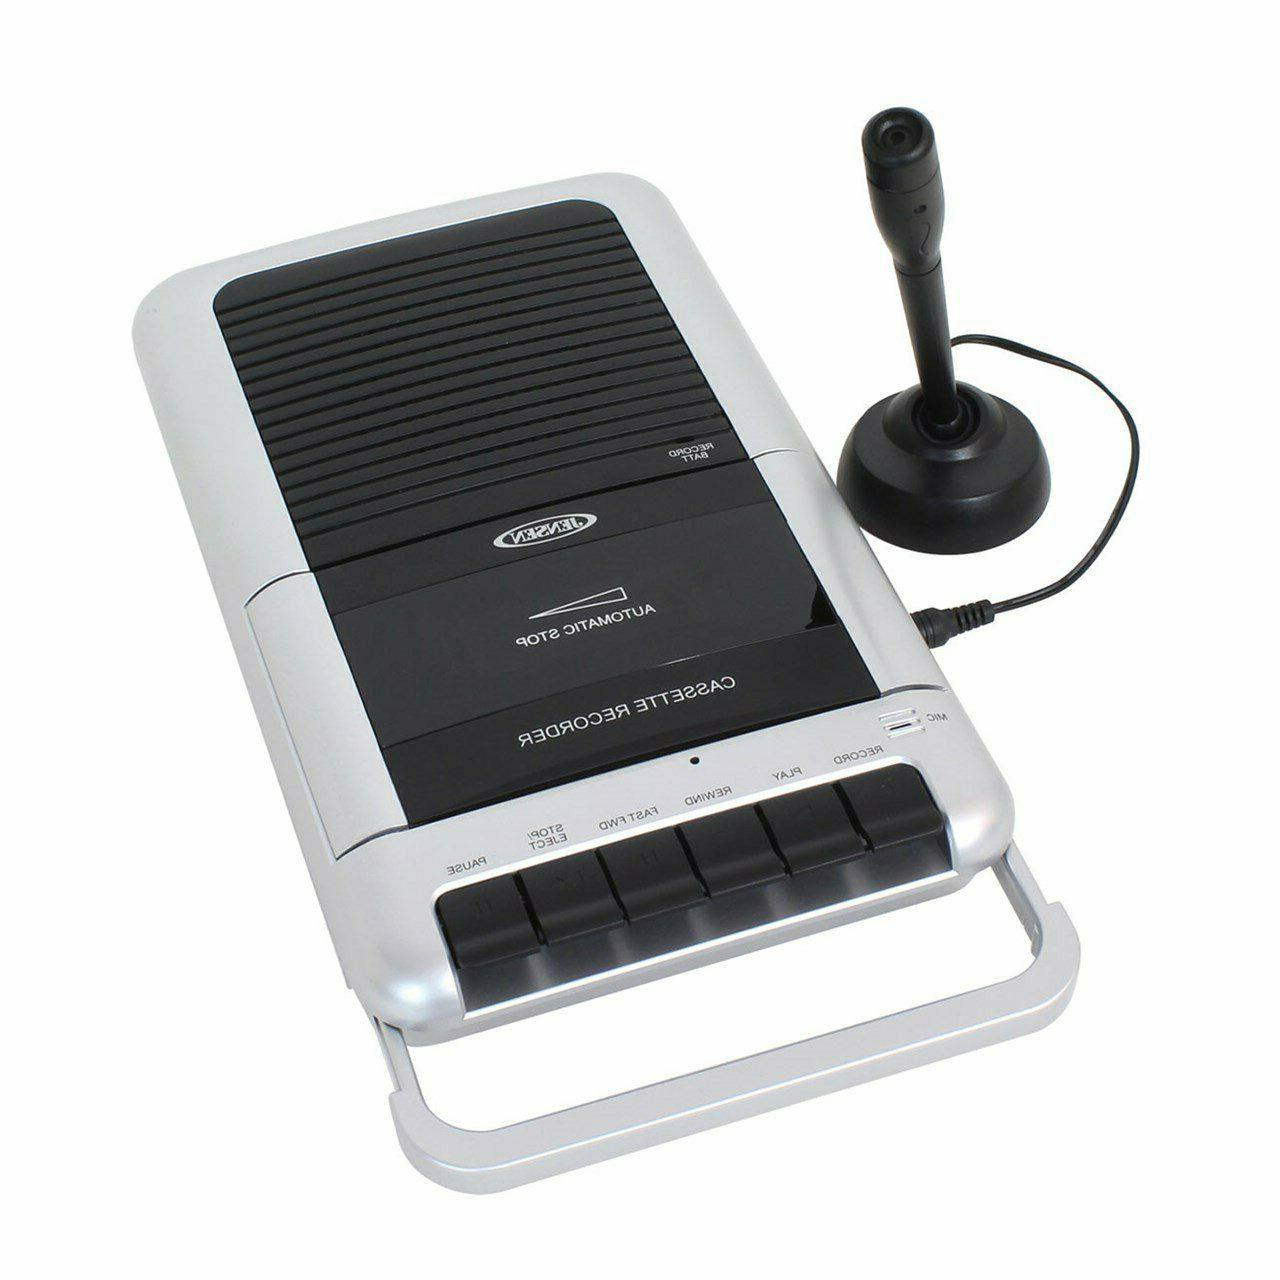 mcr 100 cassette player recorder